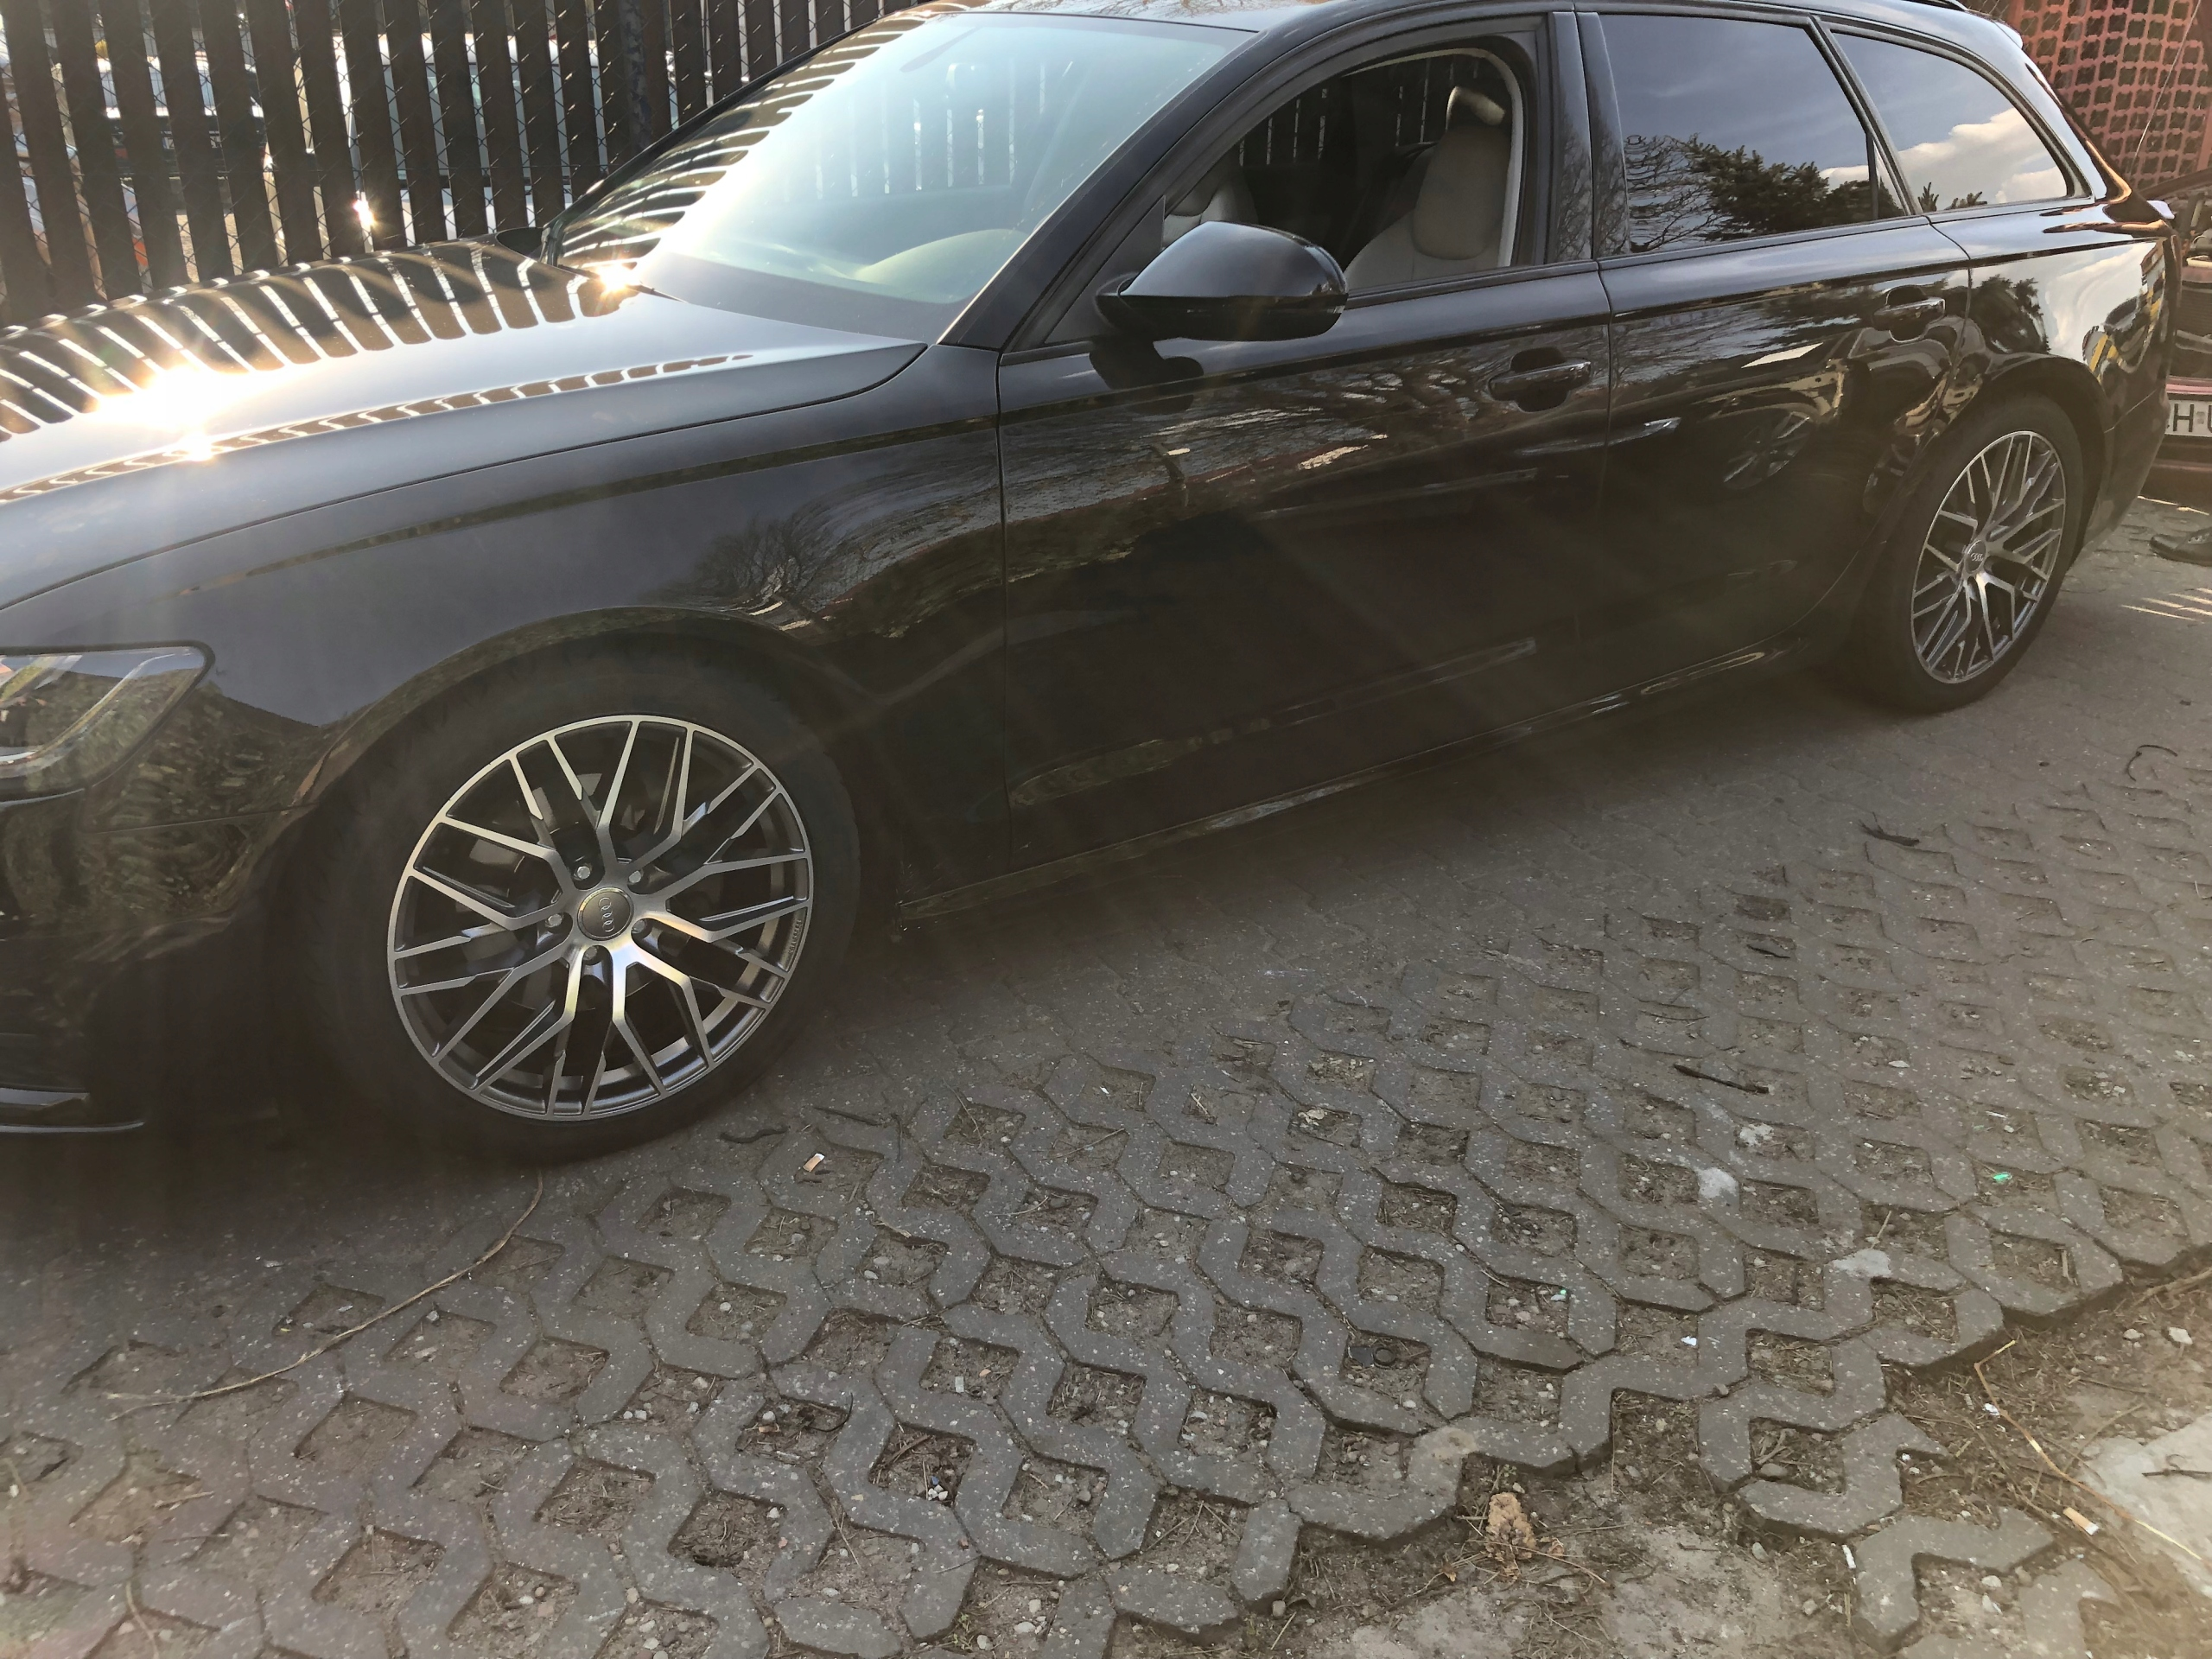 I Rs4 18 5x112 30 Audi A5 S5 A4 B8 A6 C7 C8 Rs6 Xdalys Lt